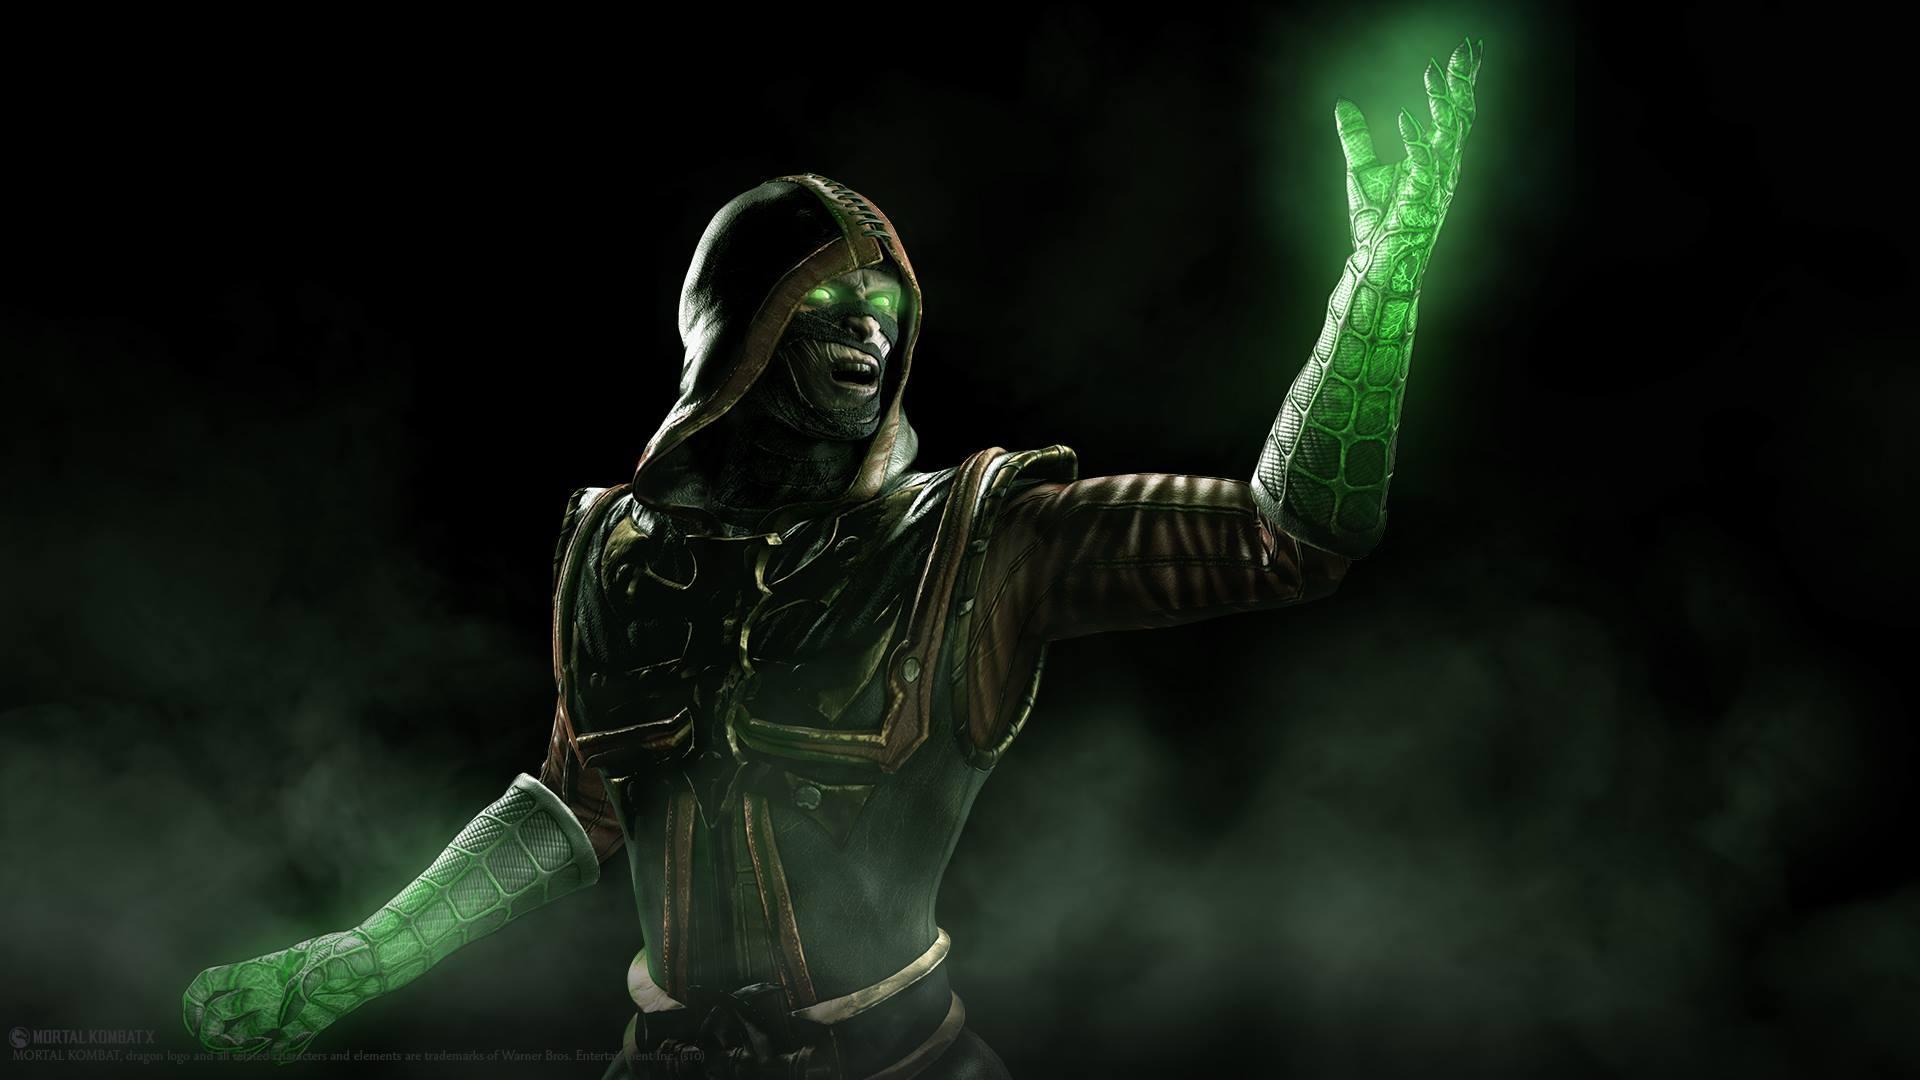 Mortal Kombat X - Mortal Kombat X Ermac, Смертельная битва 10